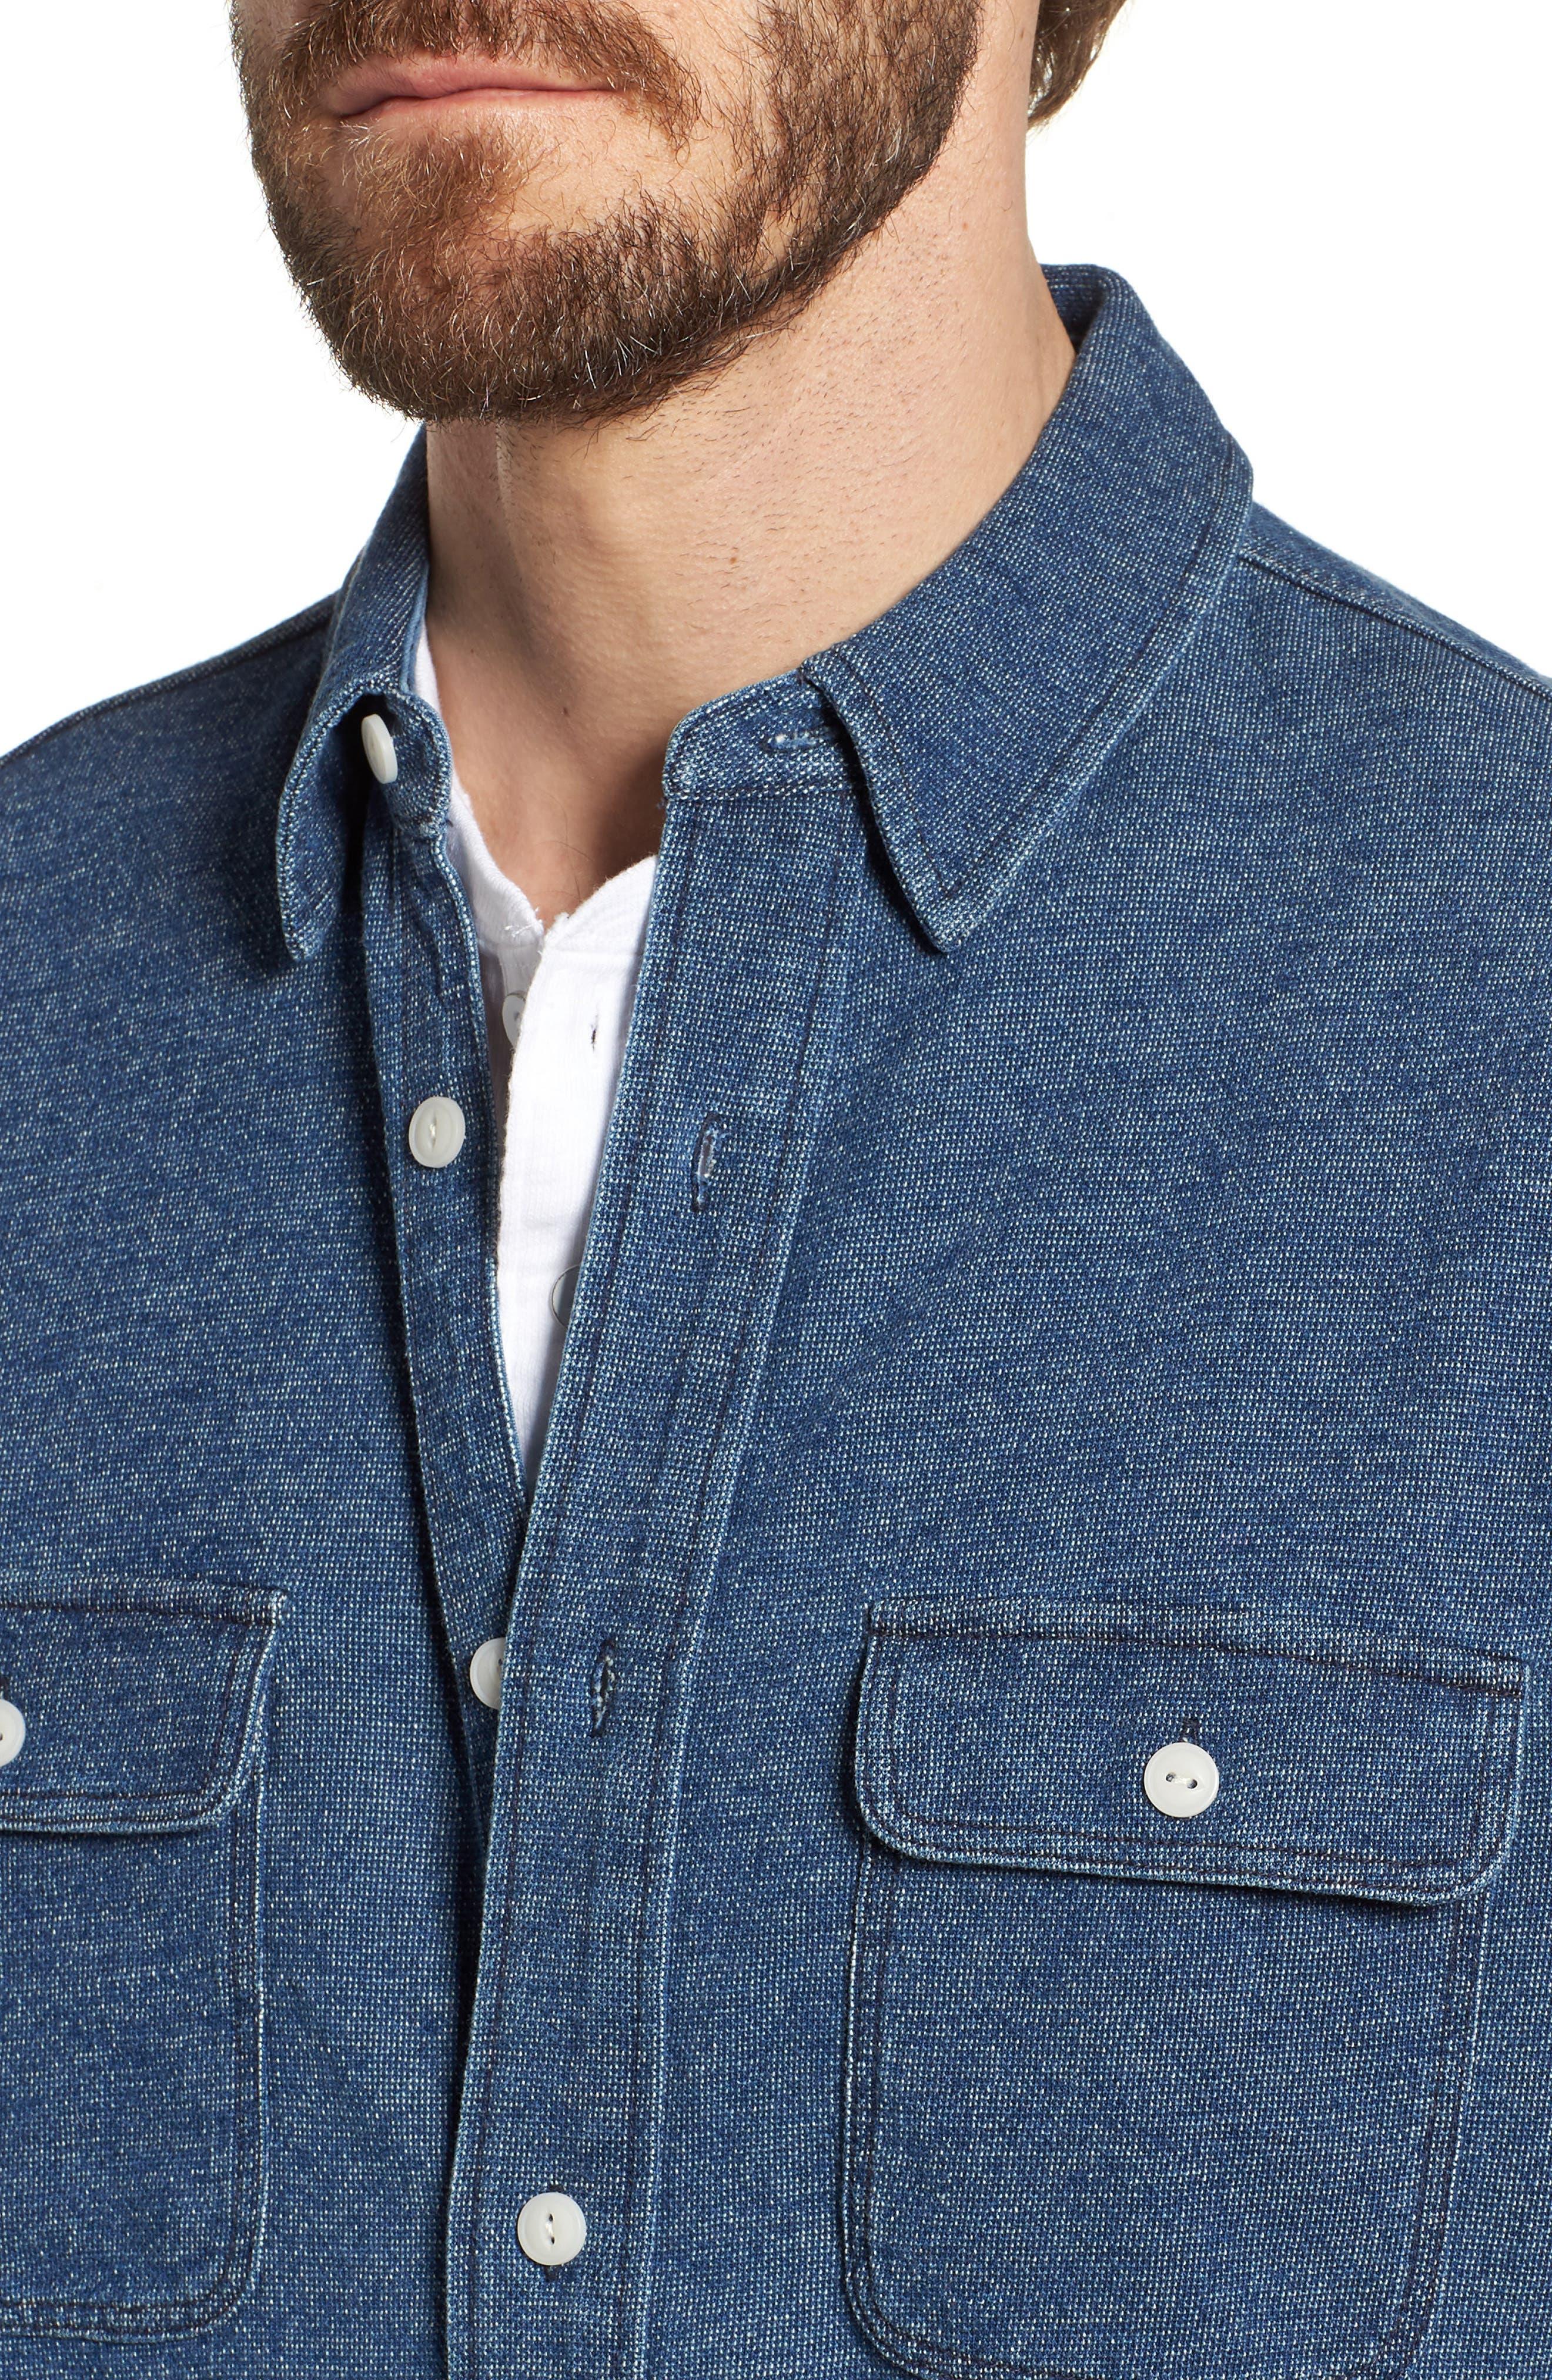 Belmar Chambray Knit Sport Shirt,                             Alternate thumbnail 4, color,                             420